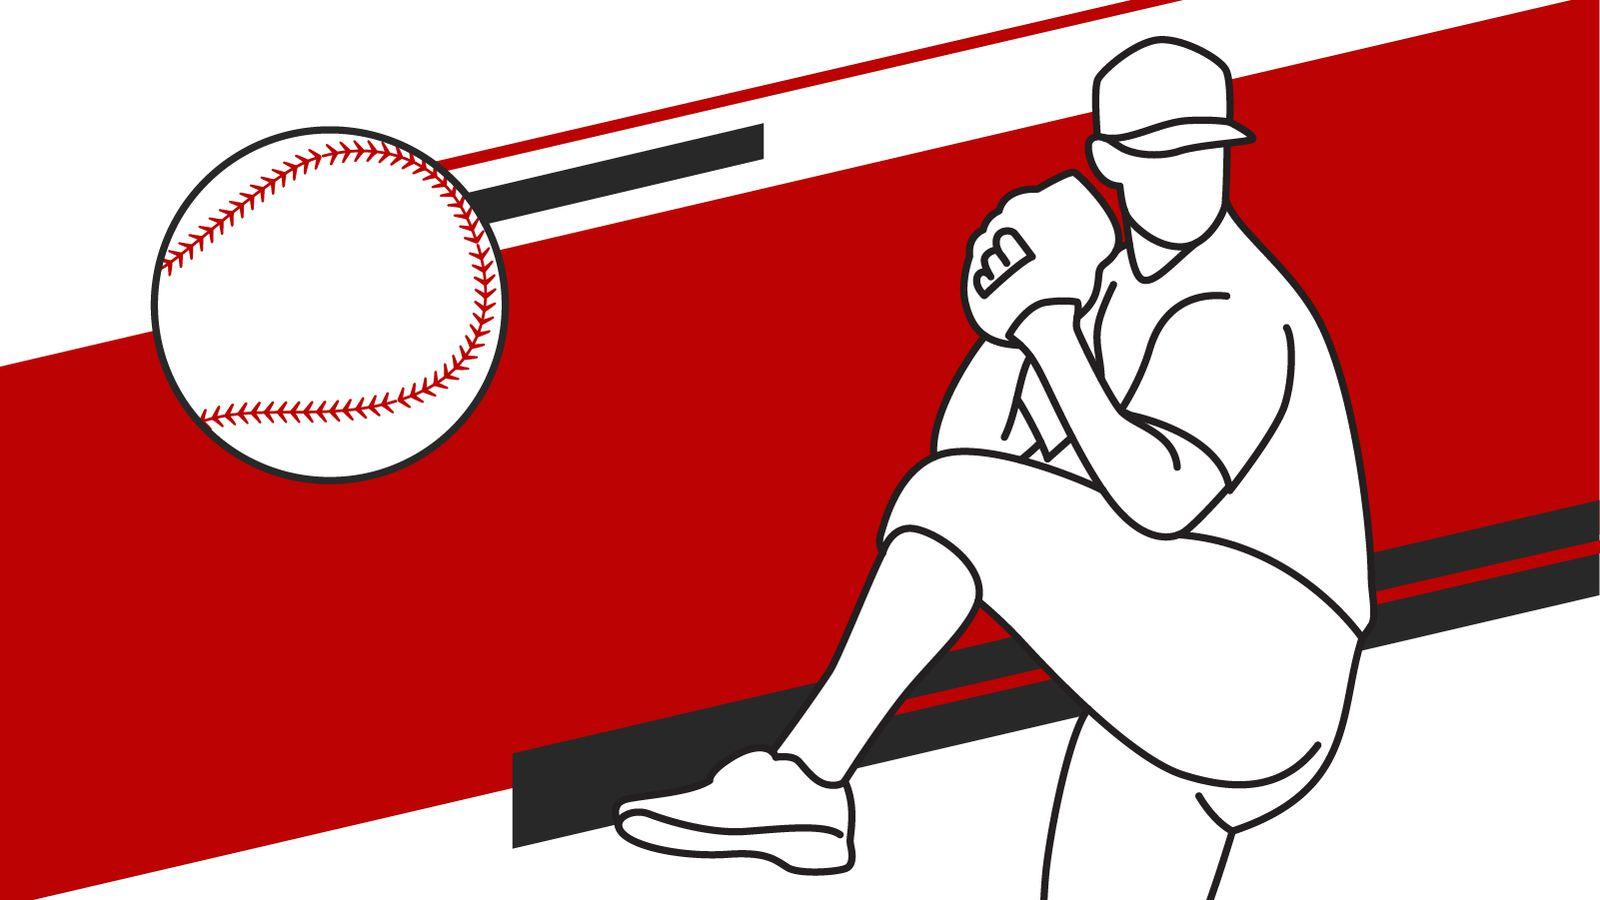 the physics behind baseball Alan m nathan, professor emeritus of physics at university of illinois and avid boston red sox fan, presents important research in the physics of baseball.